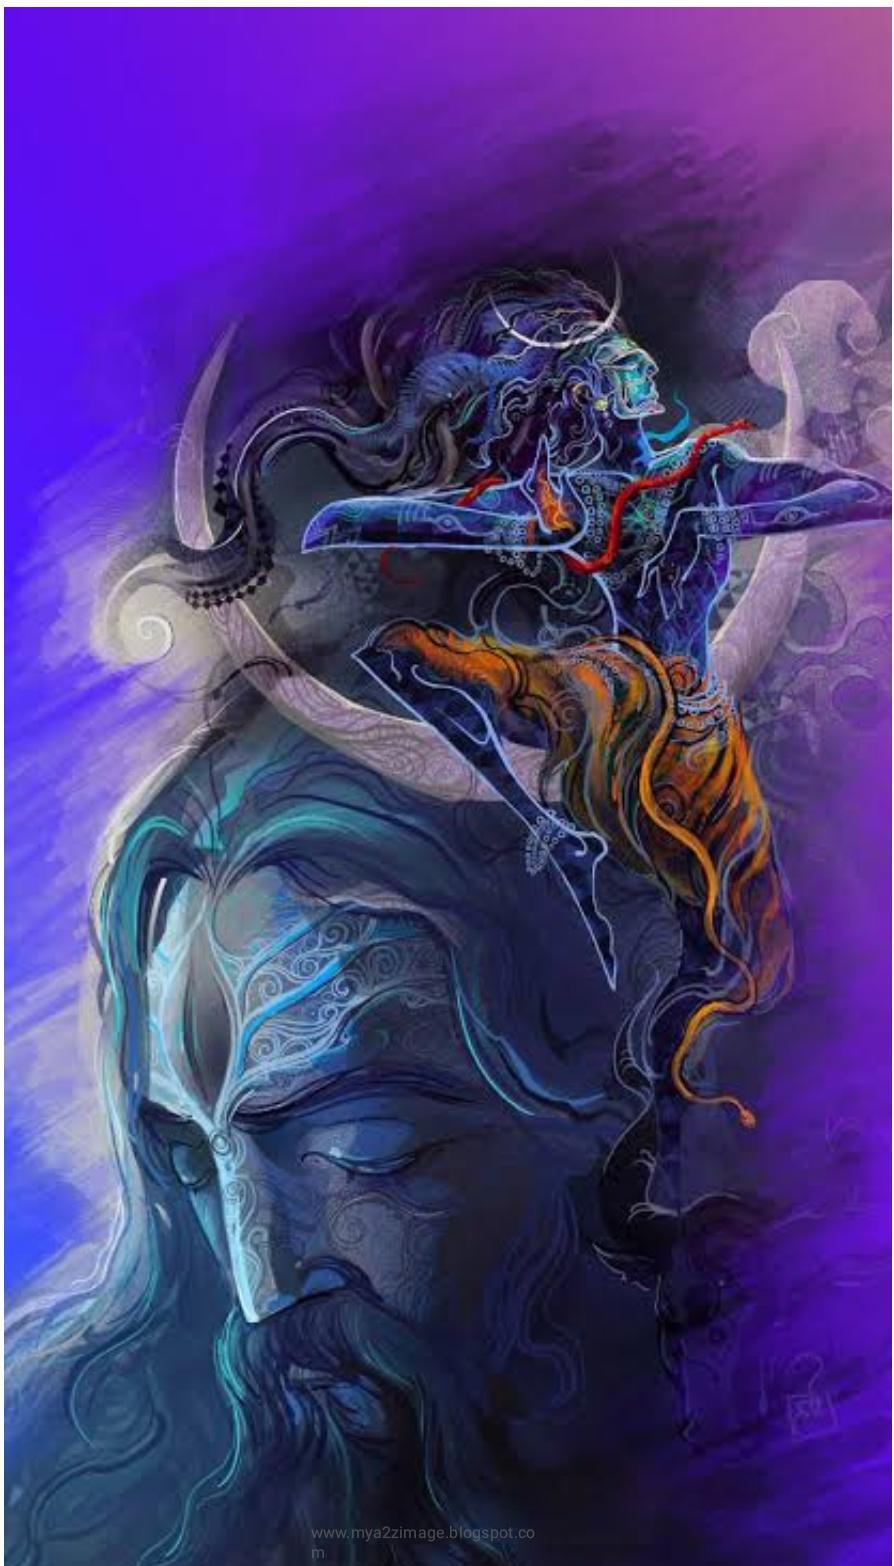 Lord shiva hd image free download